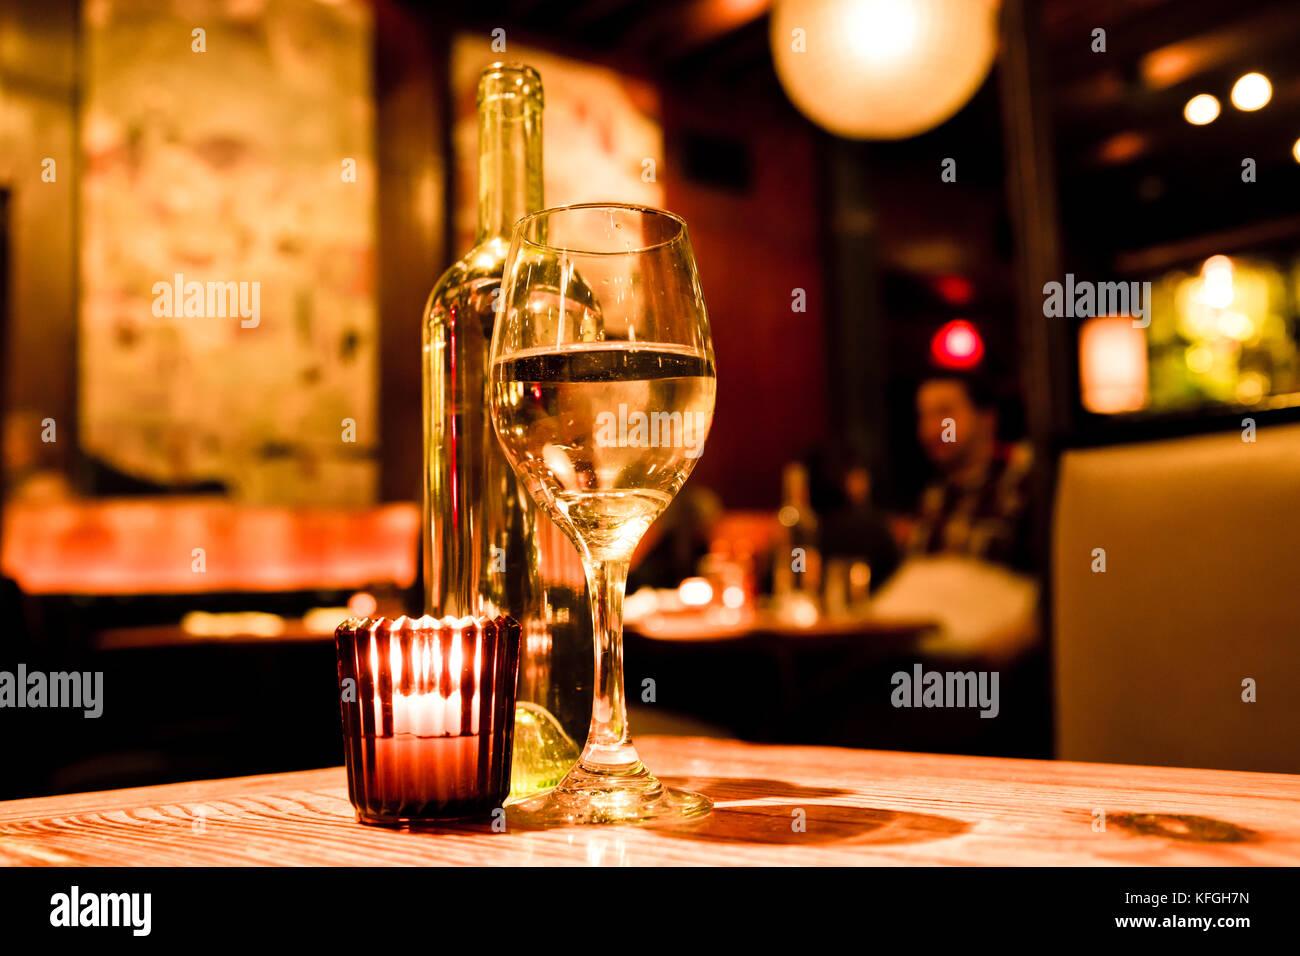 wine glass and lights stockfotos wine glass and lights bilder alamy. Black Bedroom Furniture Sets. Home Design Ideas